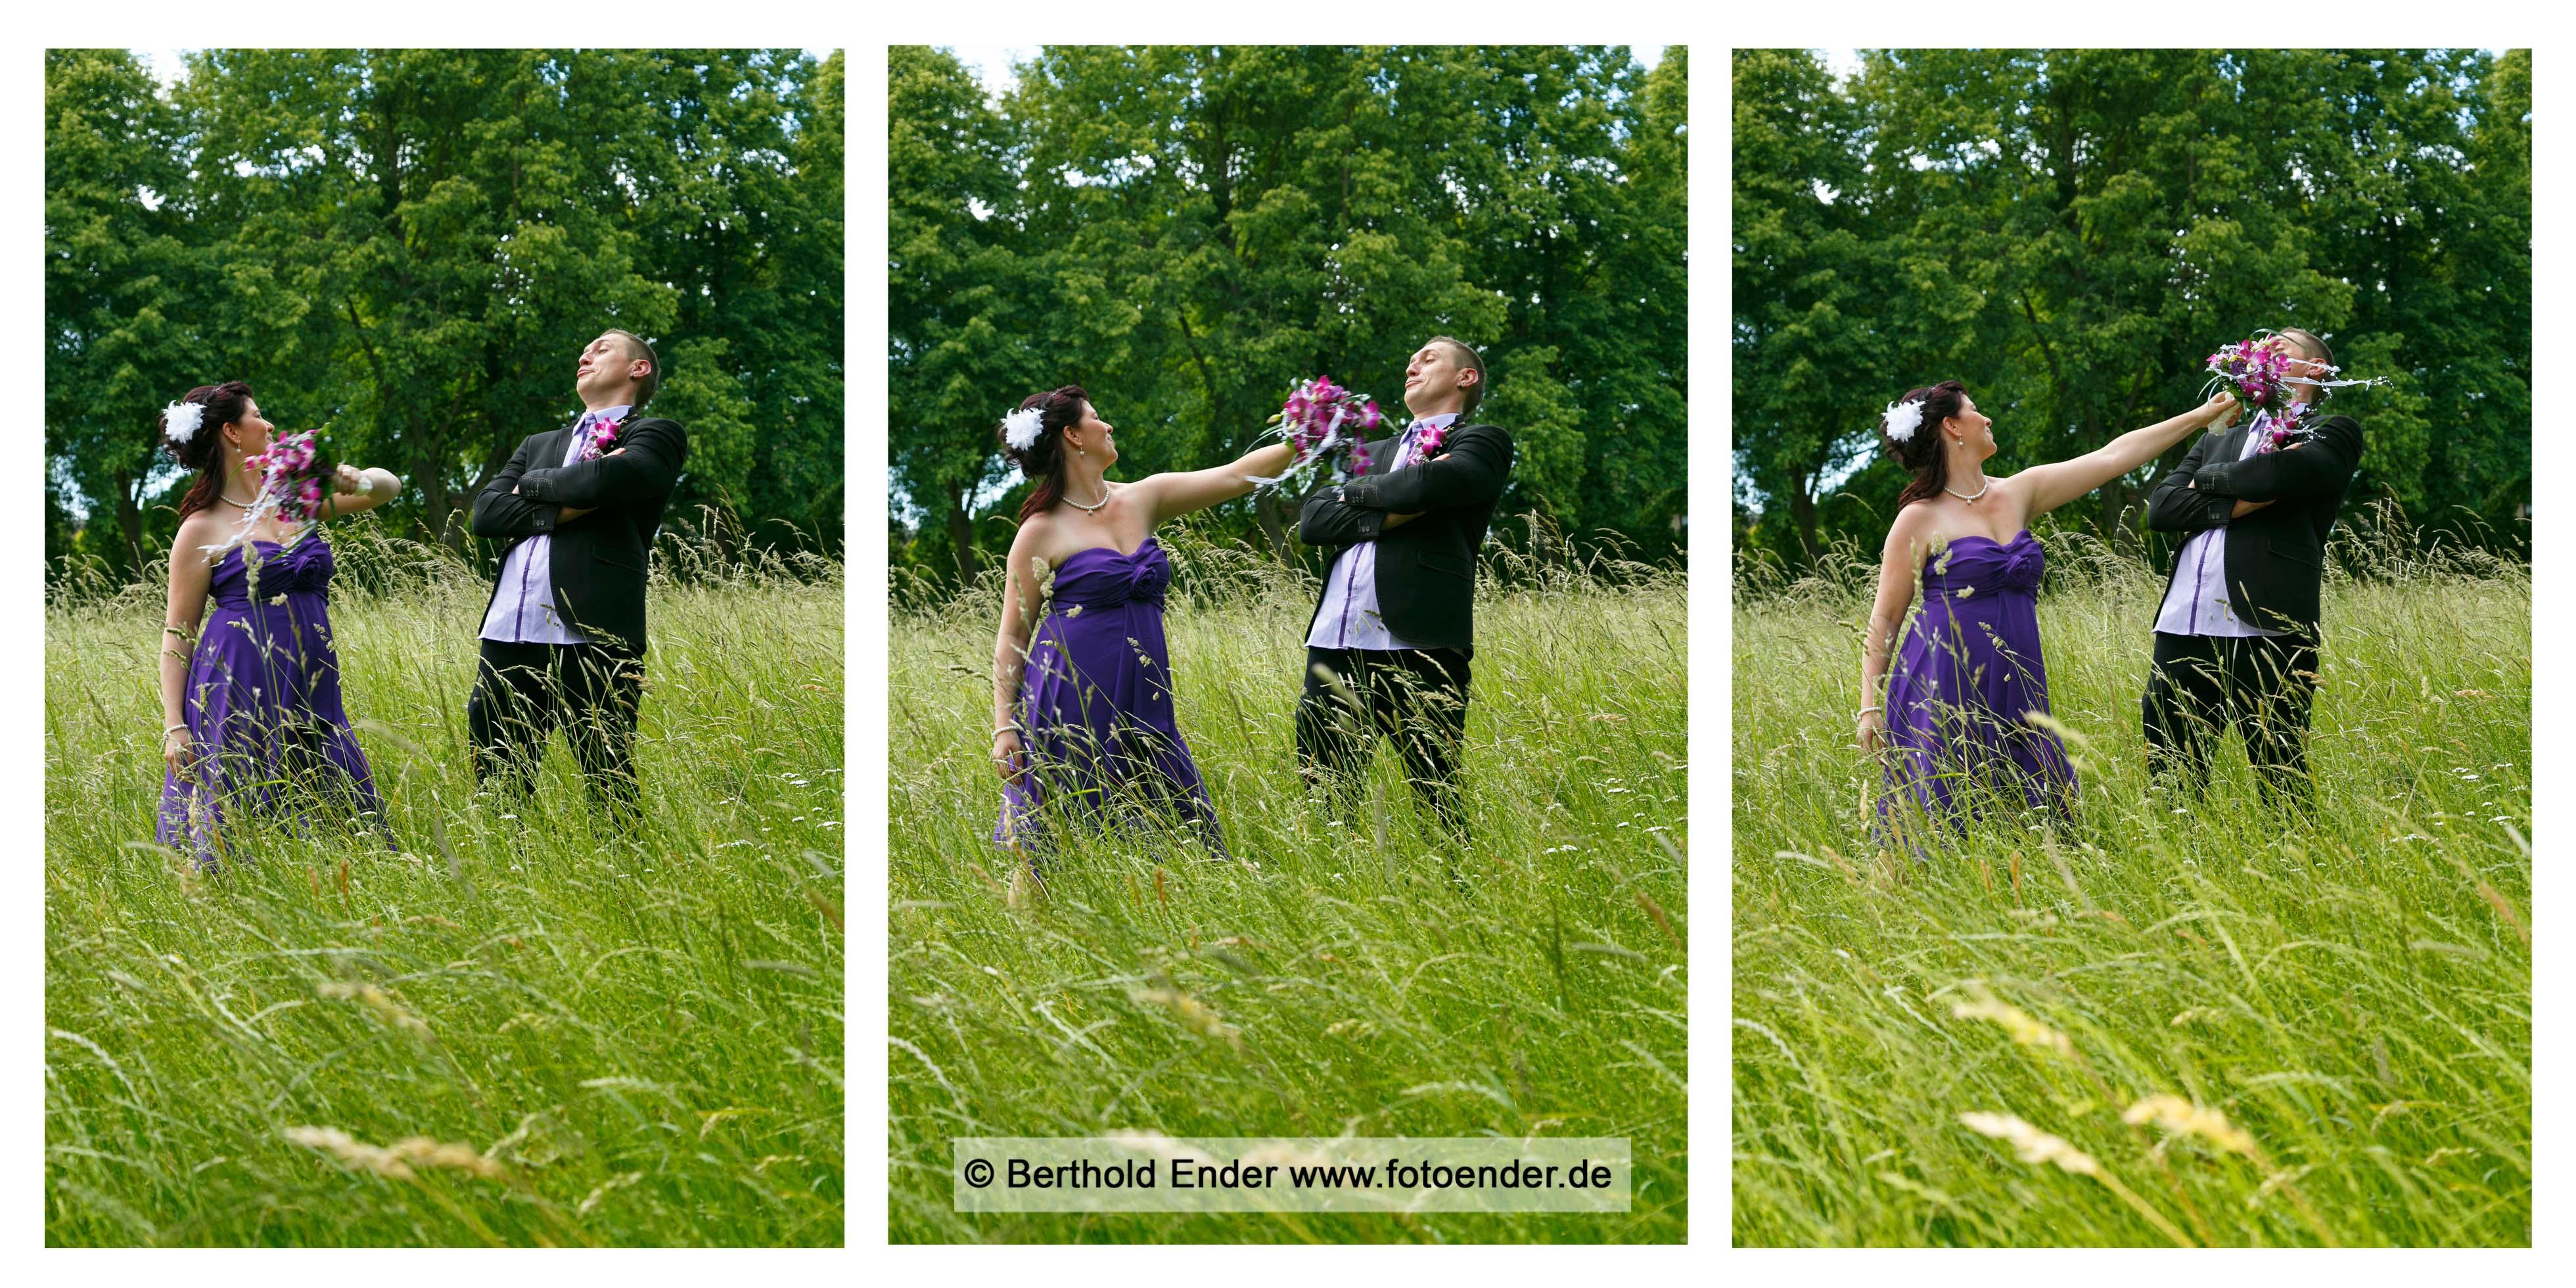 Heiraten in Wörlitz - Brautpaarfotos - Fotostudio Ender